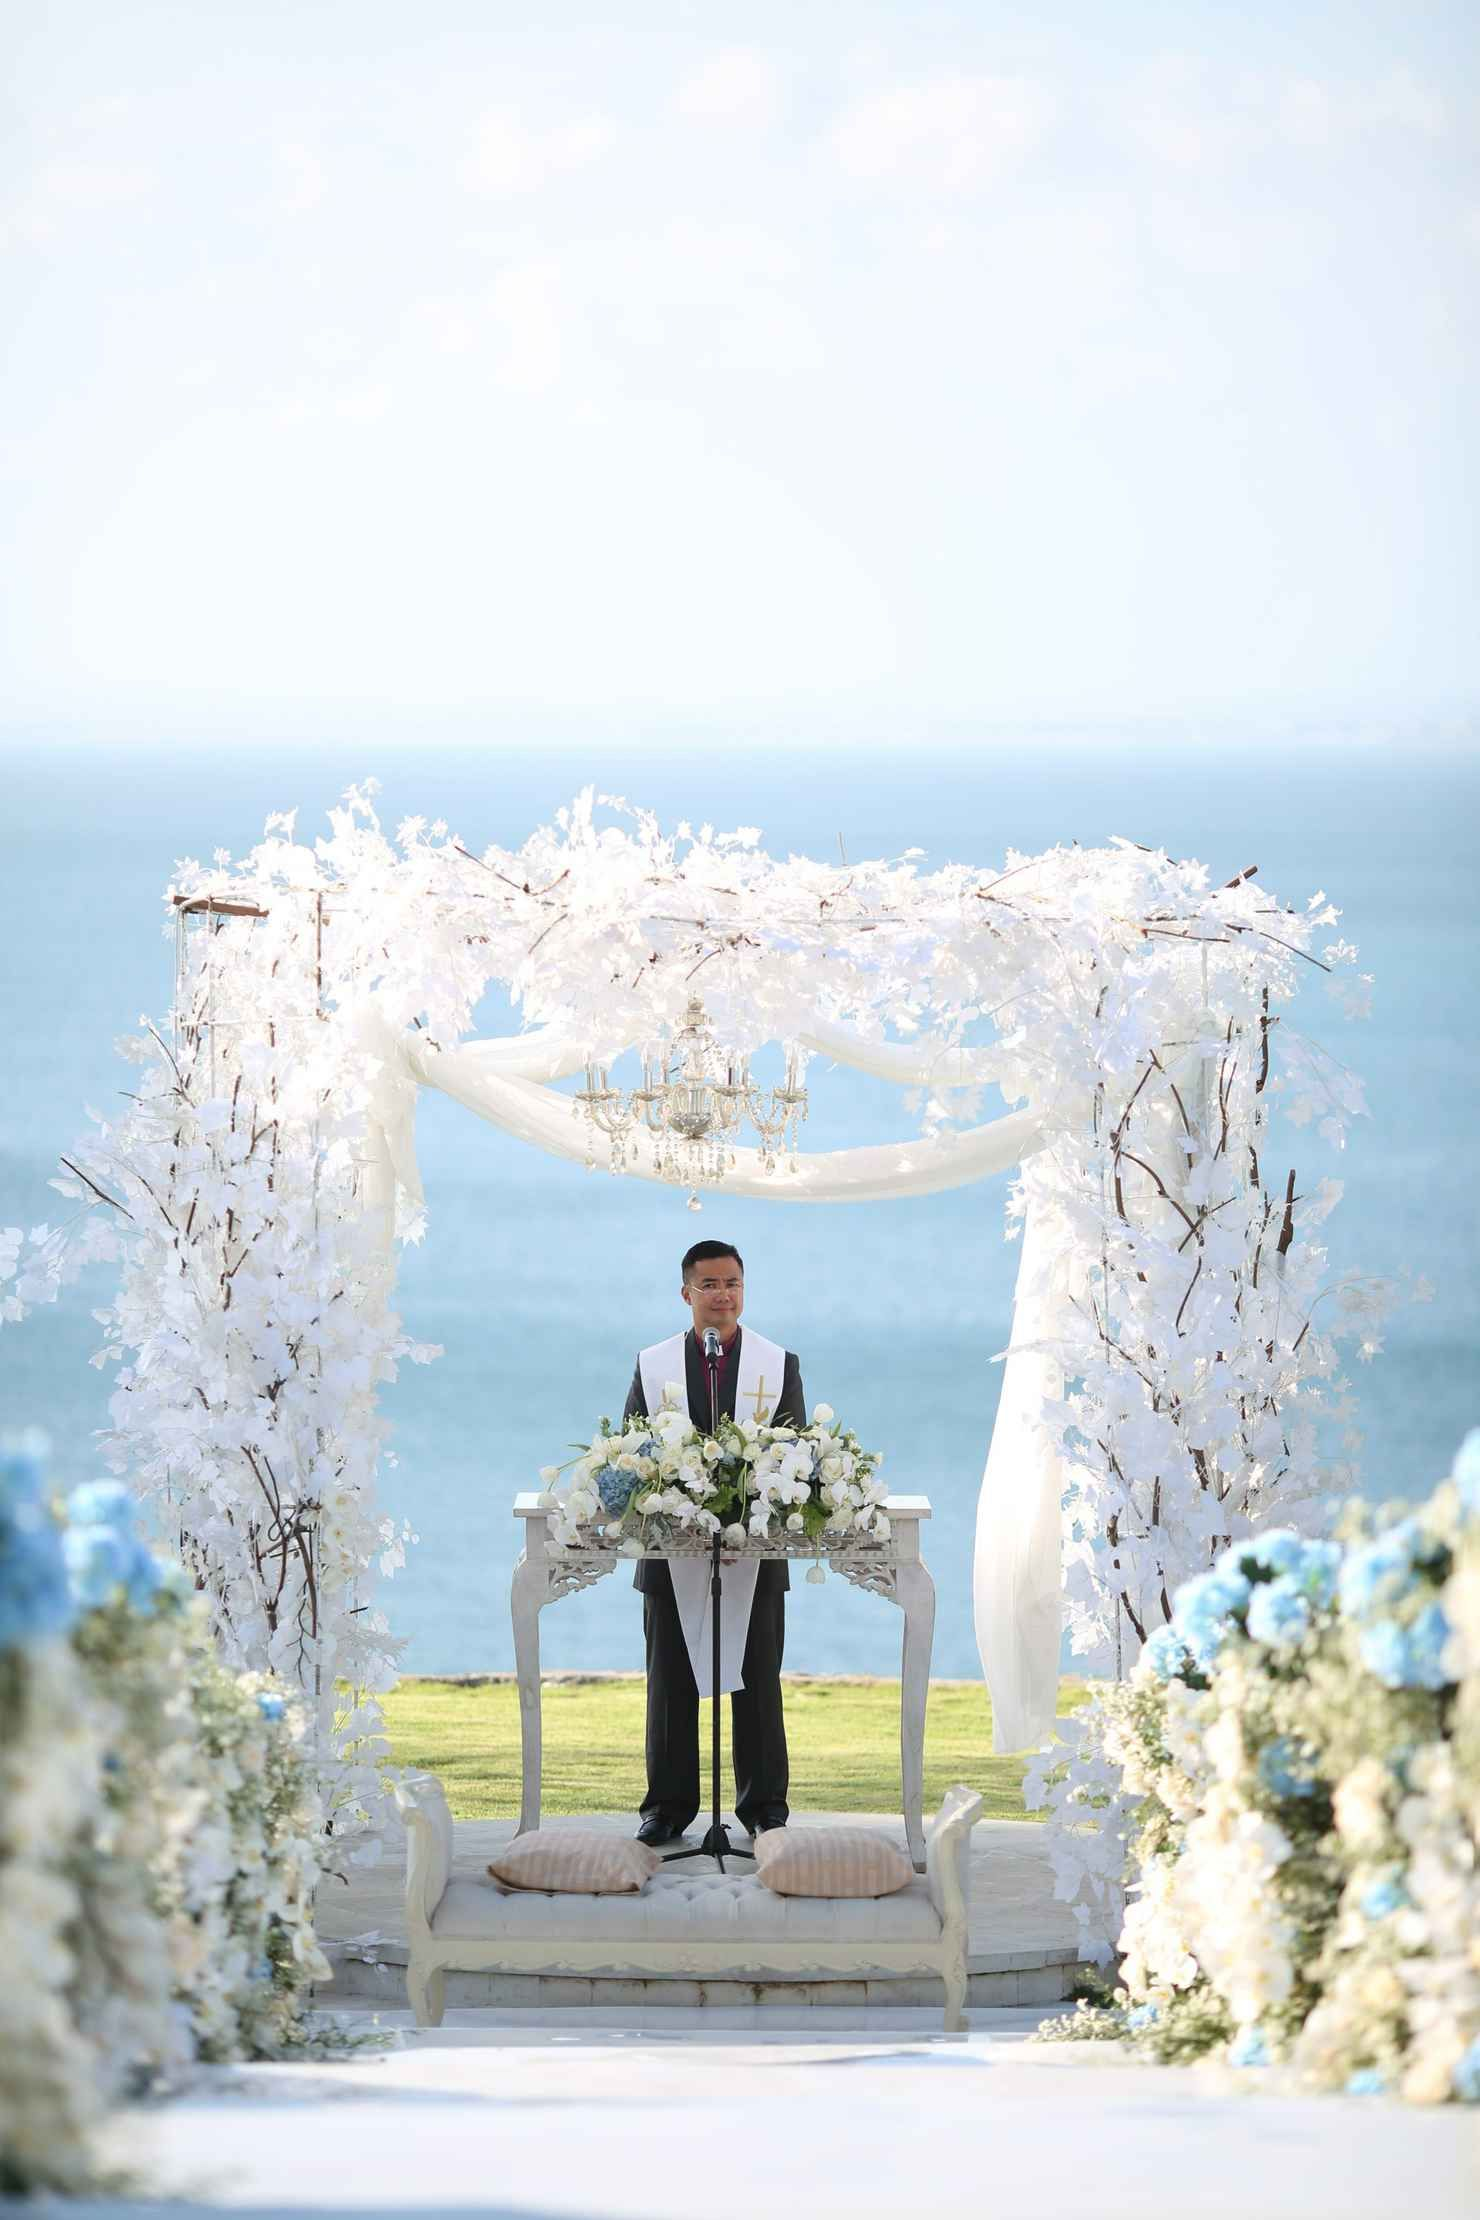 Exclusive Wedding At The Sky Venue With Ocean Views Ayana Resort And Spa Bali Package Jimbaran